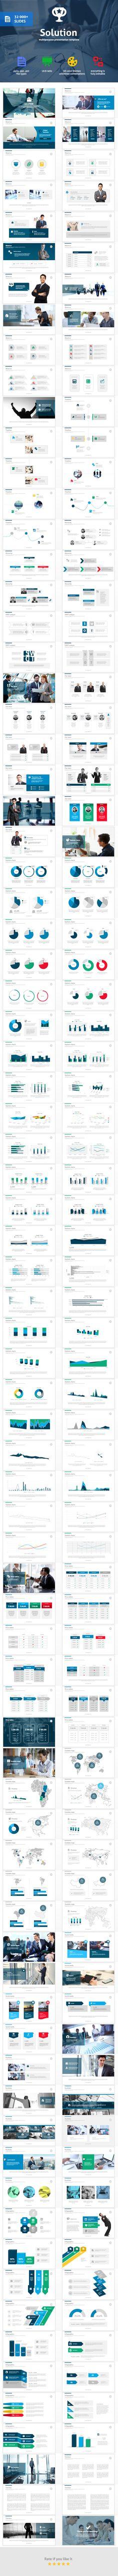 shift - multipurpose powerpoint template #design #slides, Modern powerpoint